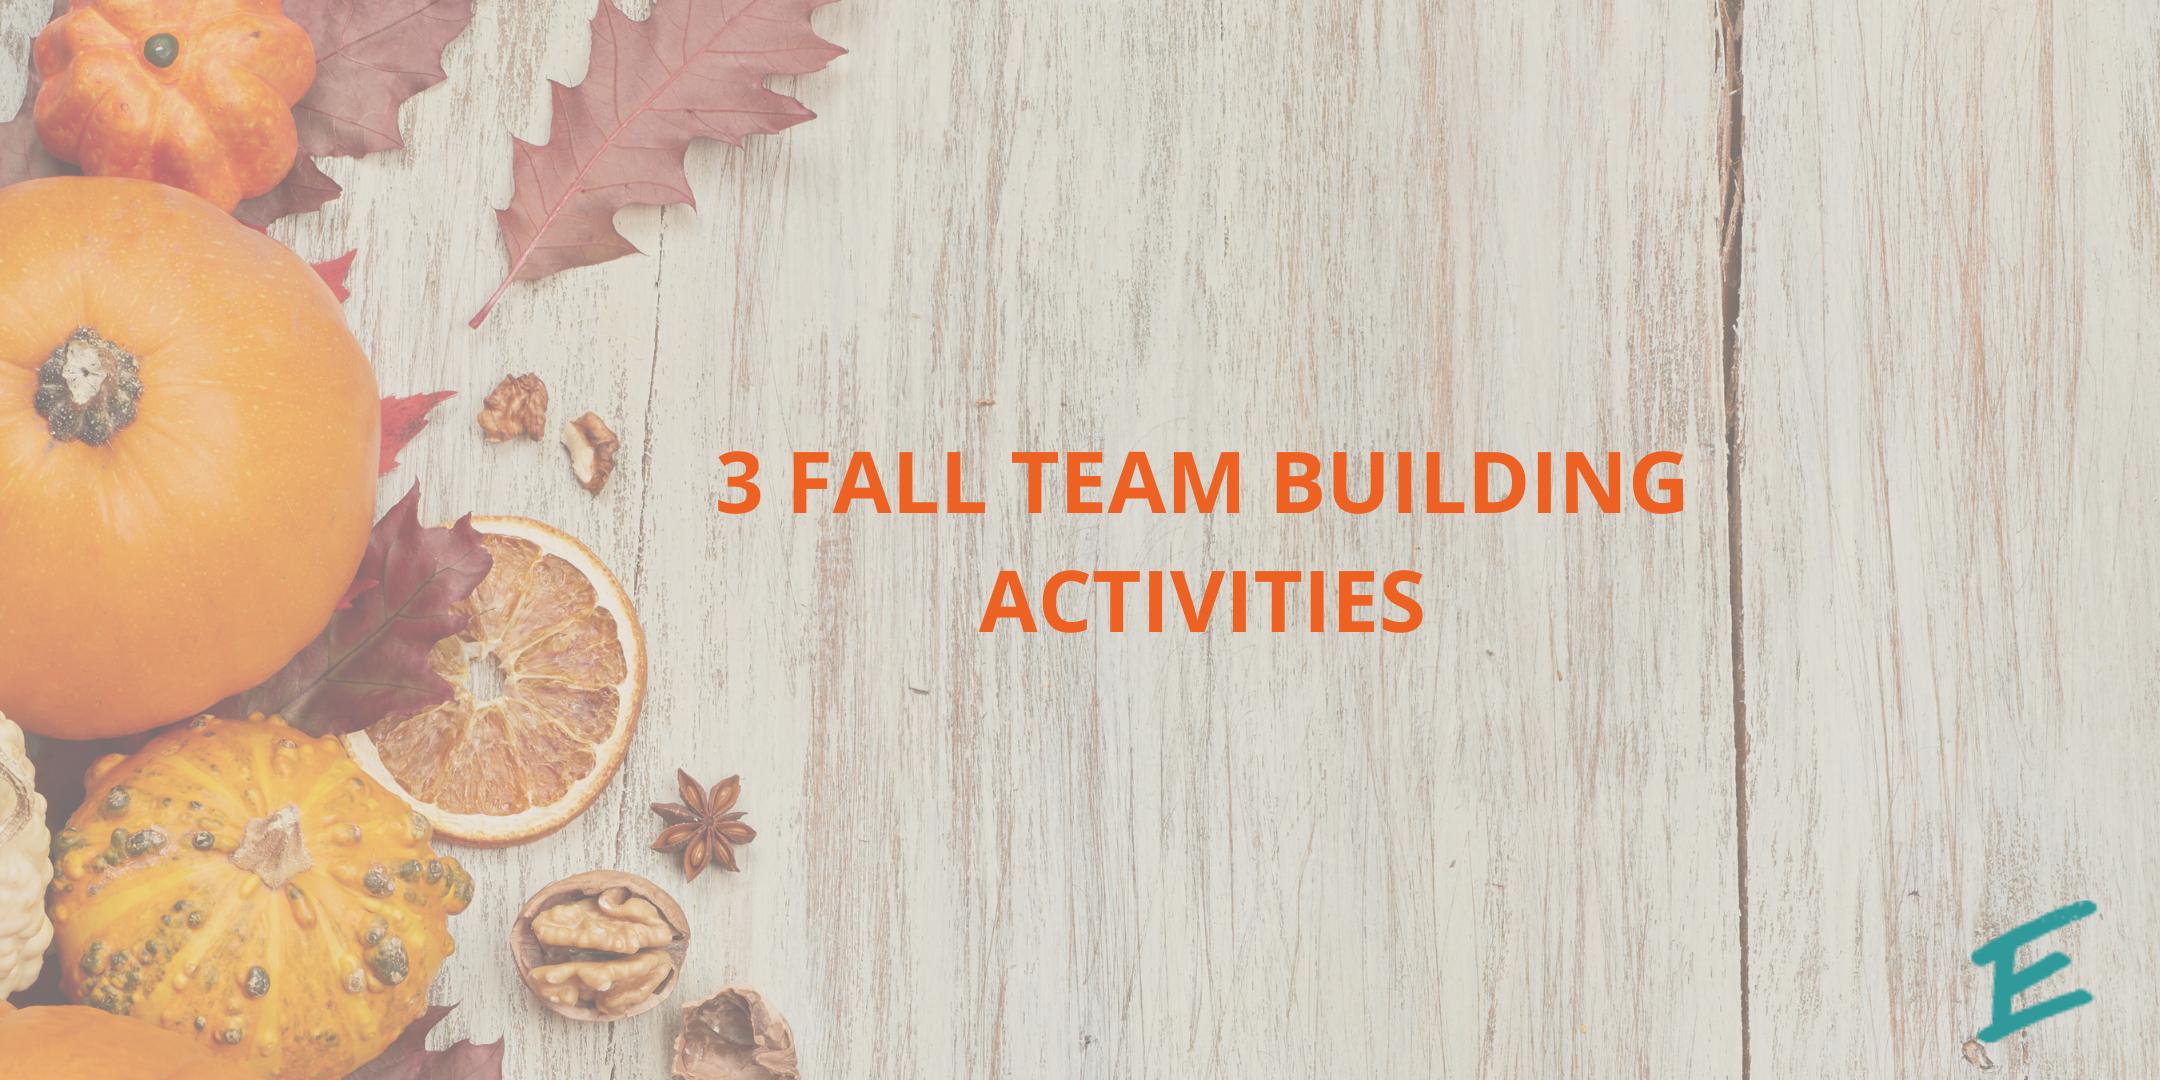 3-fall-team-building-activities